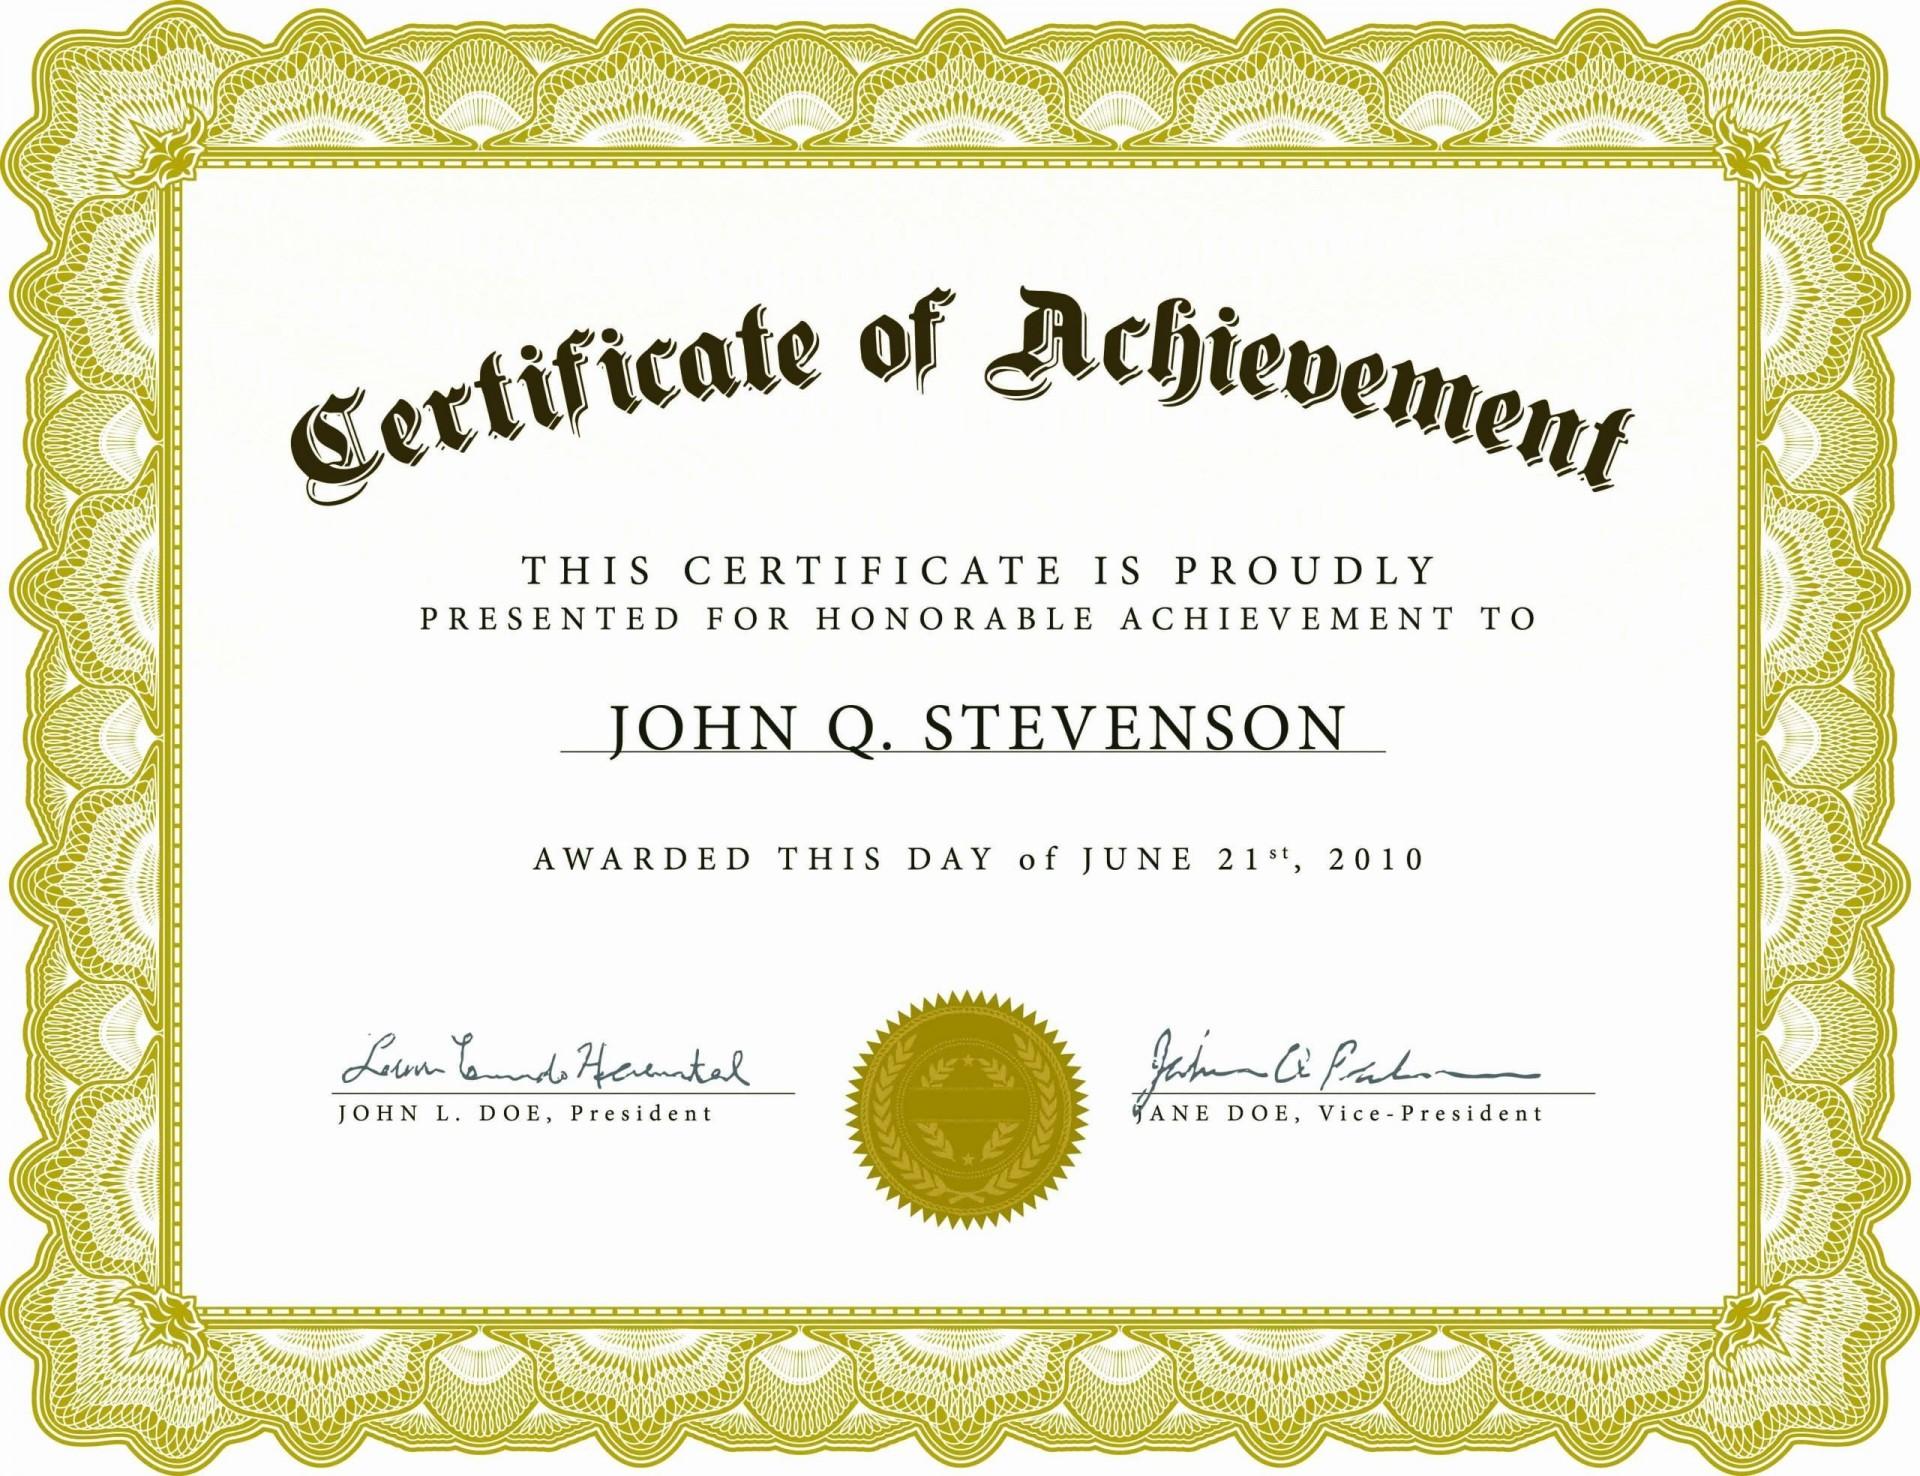 001 Impressive Microsoft Word Certificate Template Design  2003 Award M Appreciation Of Authenticity1920